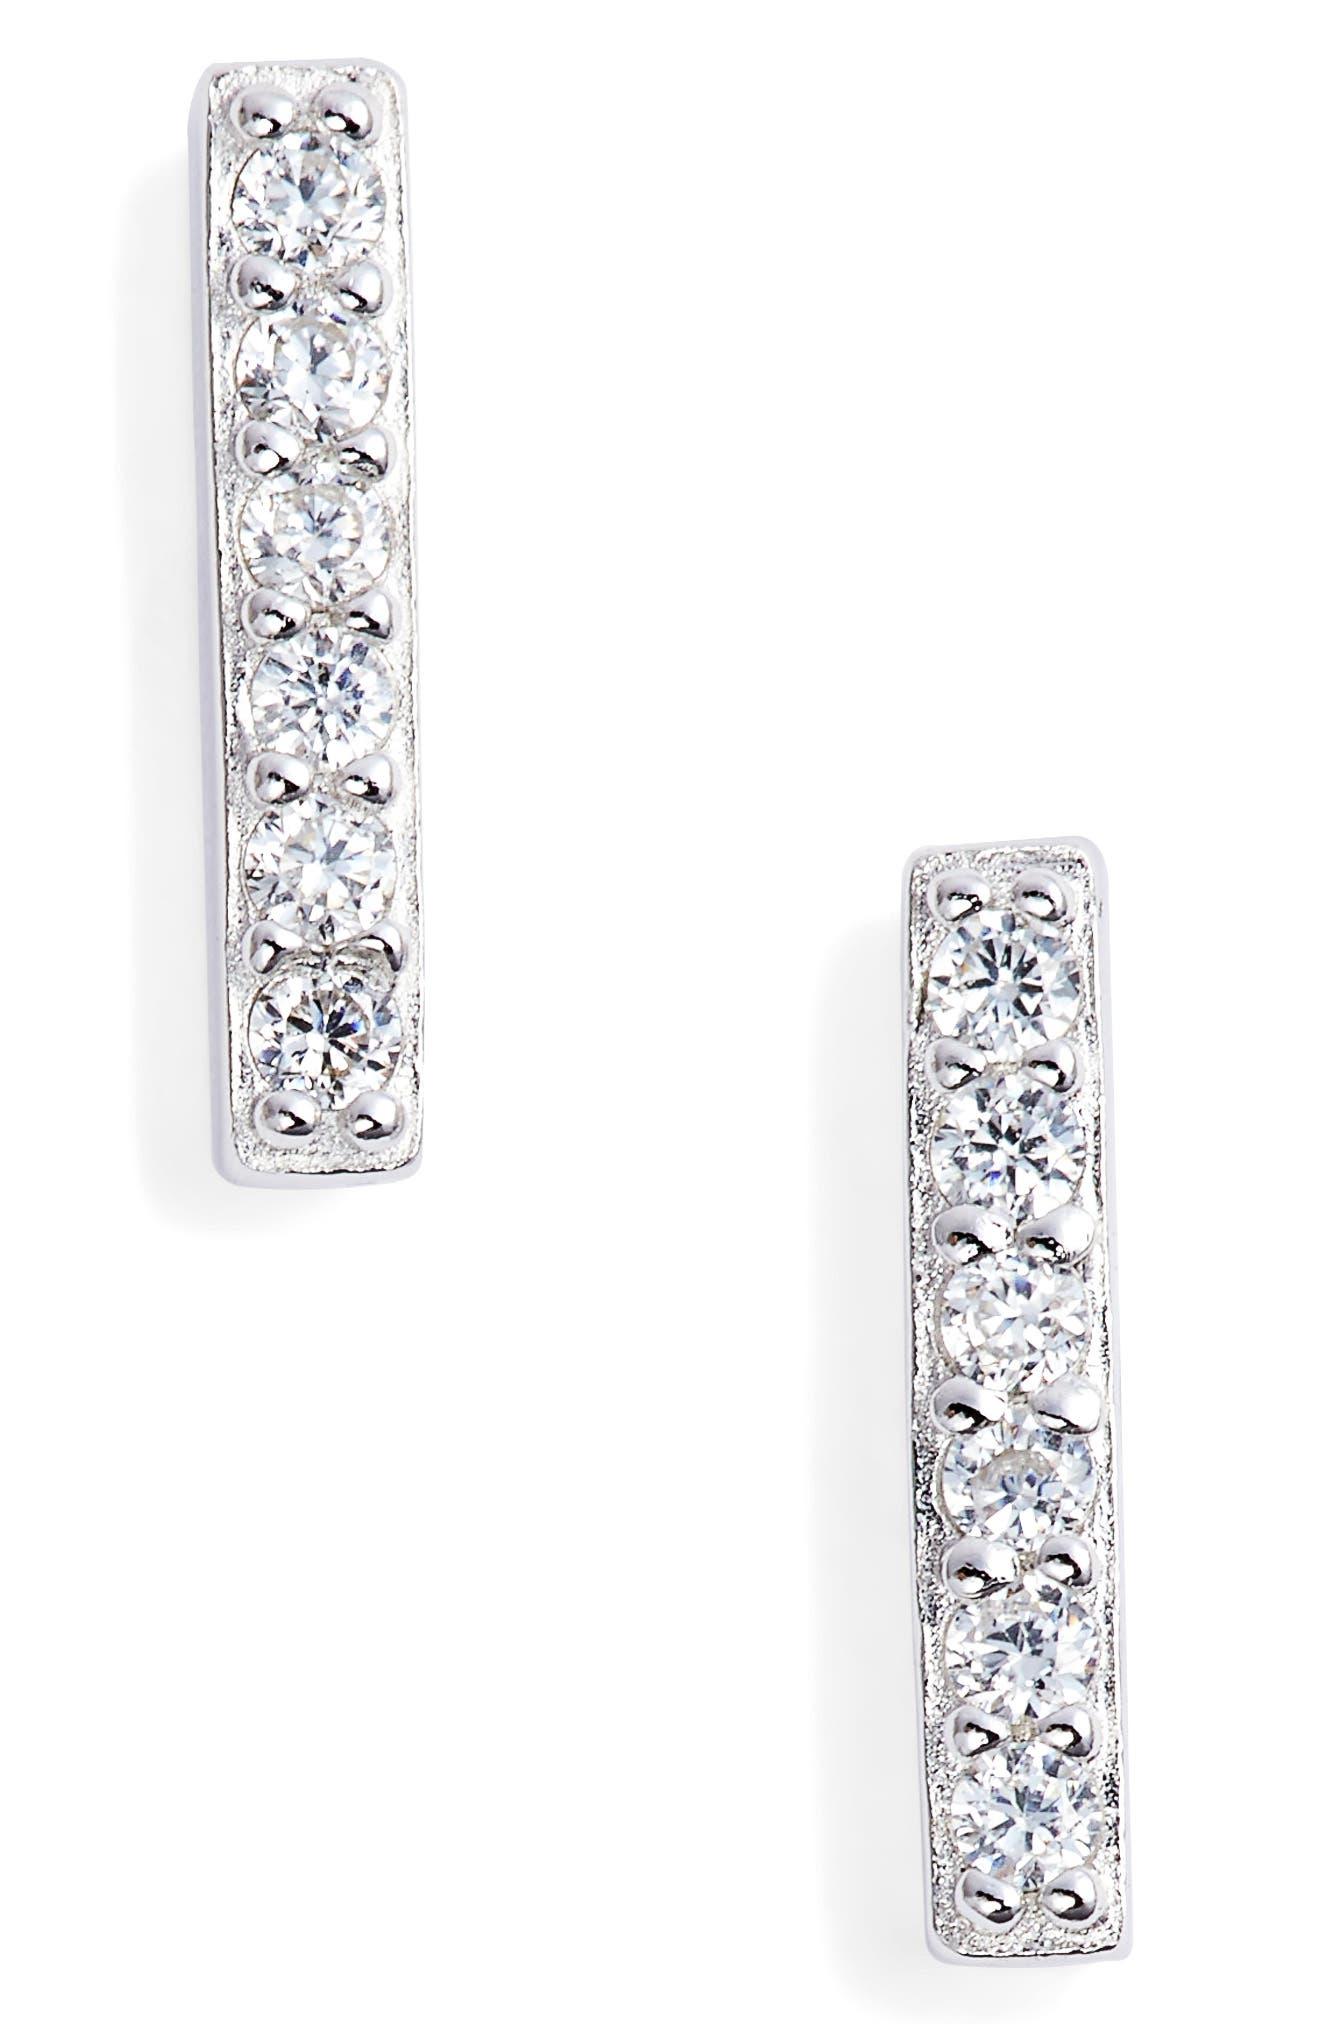 Alternate Image 1 Selected - Nordstrom Precious Metal Plated Cubic Zirconia Bar Earrings